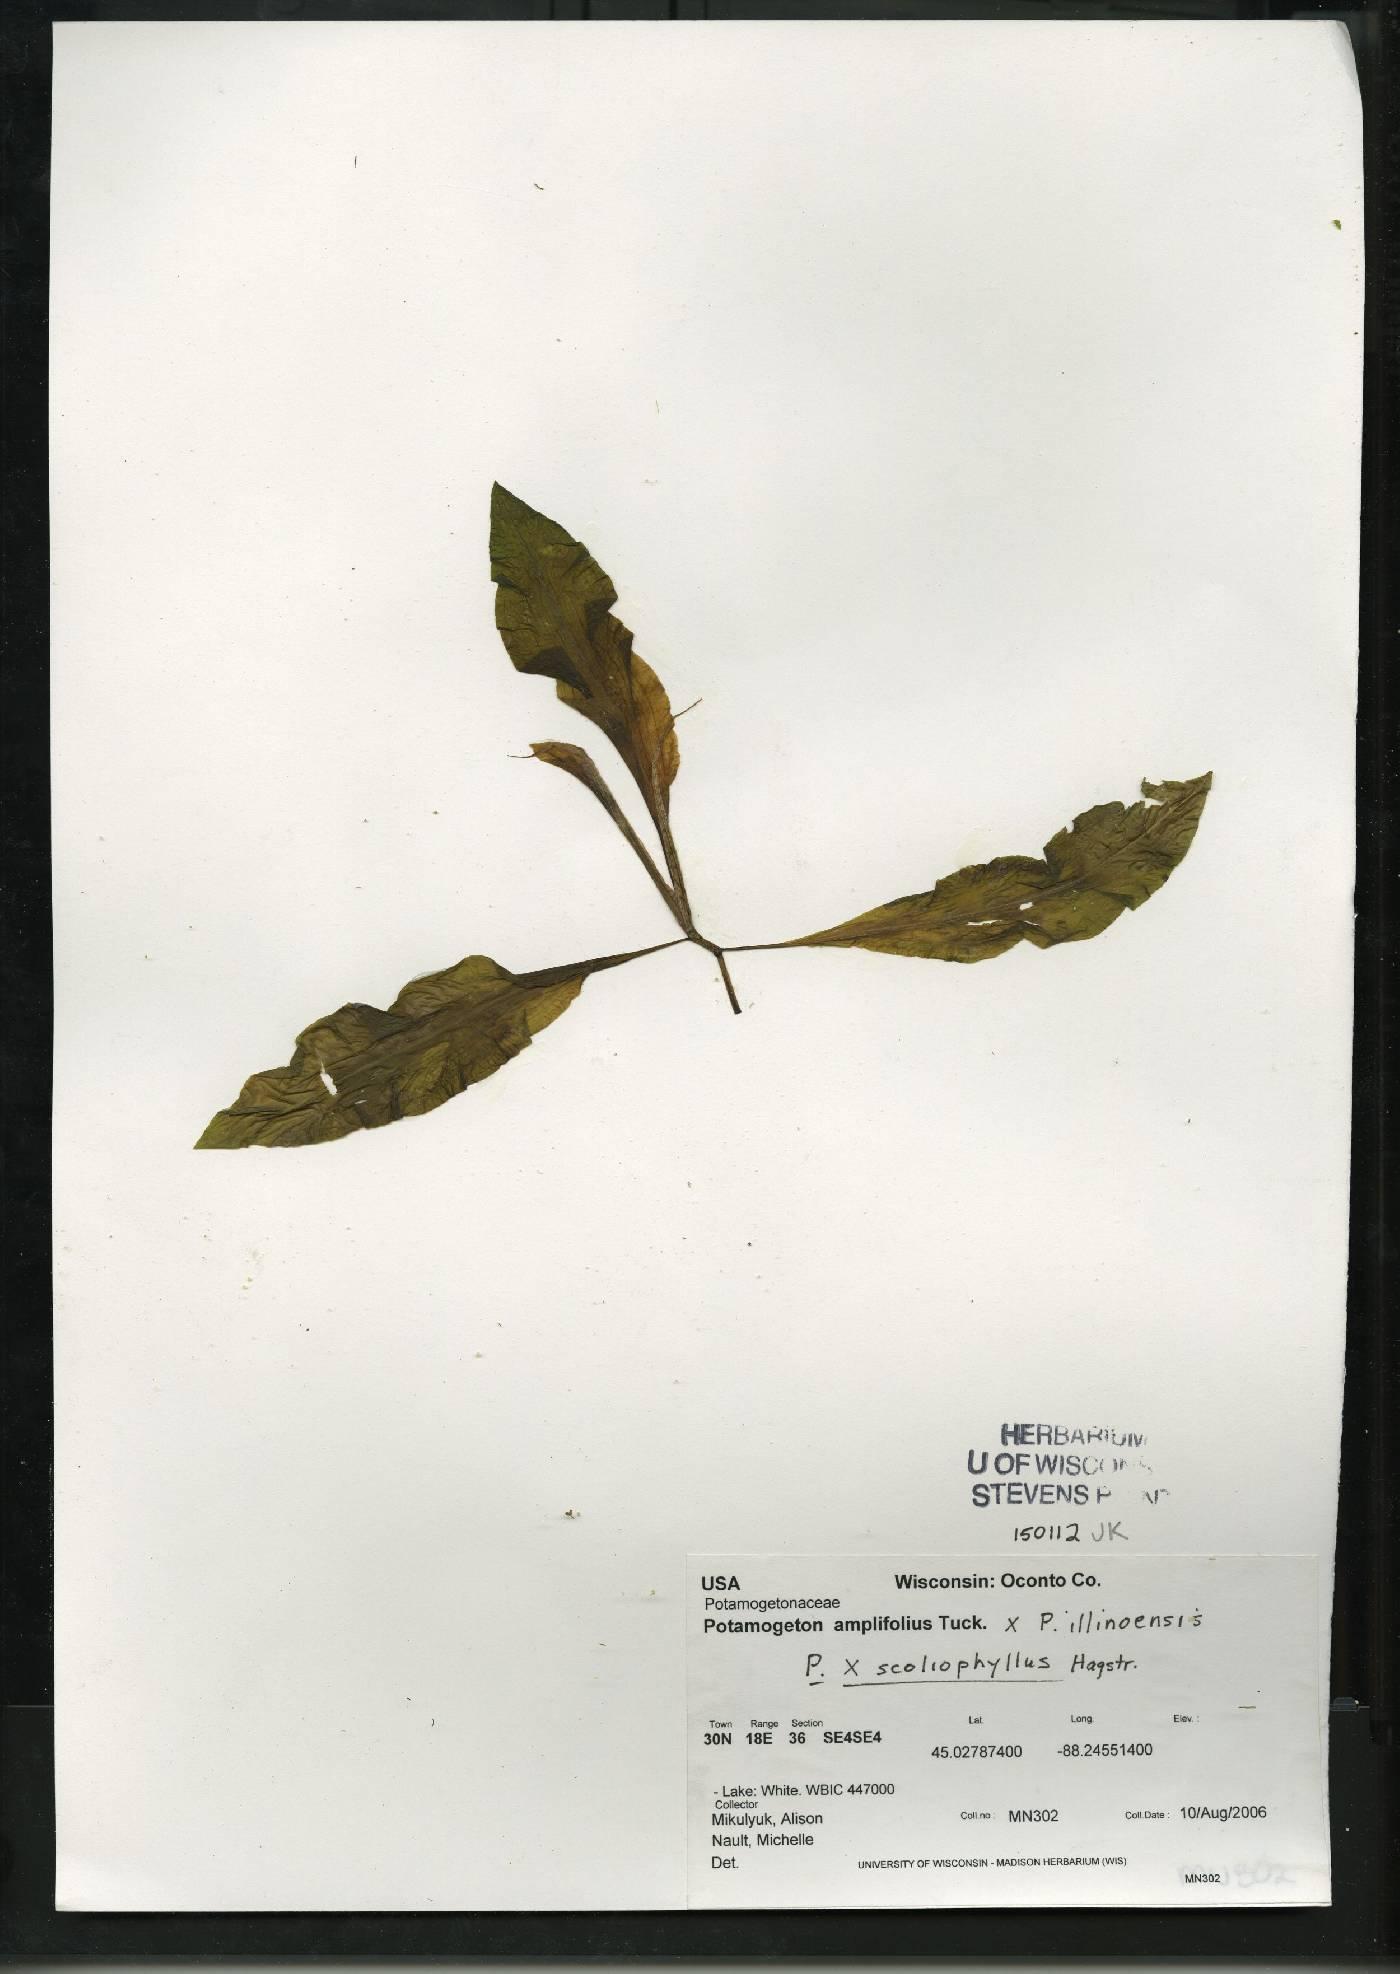 Potamogeton x scoliophyllus image